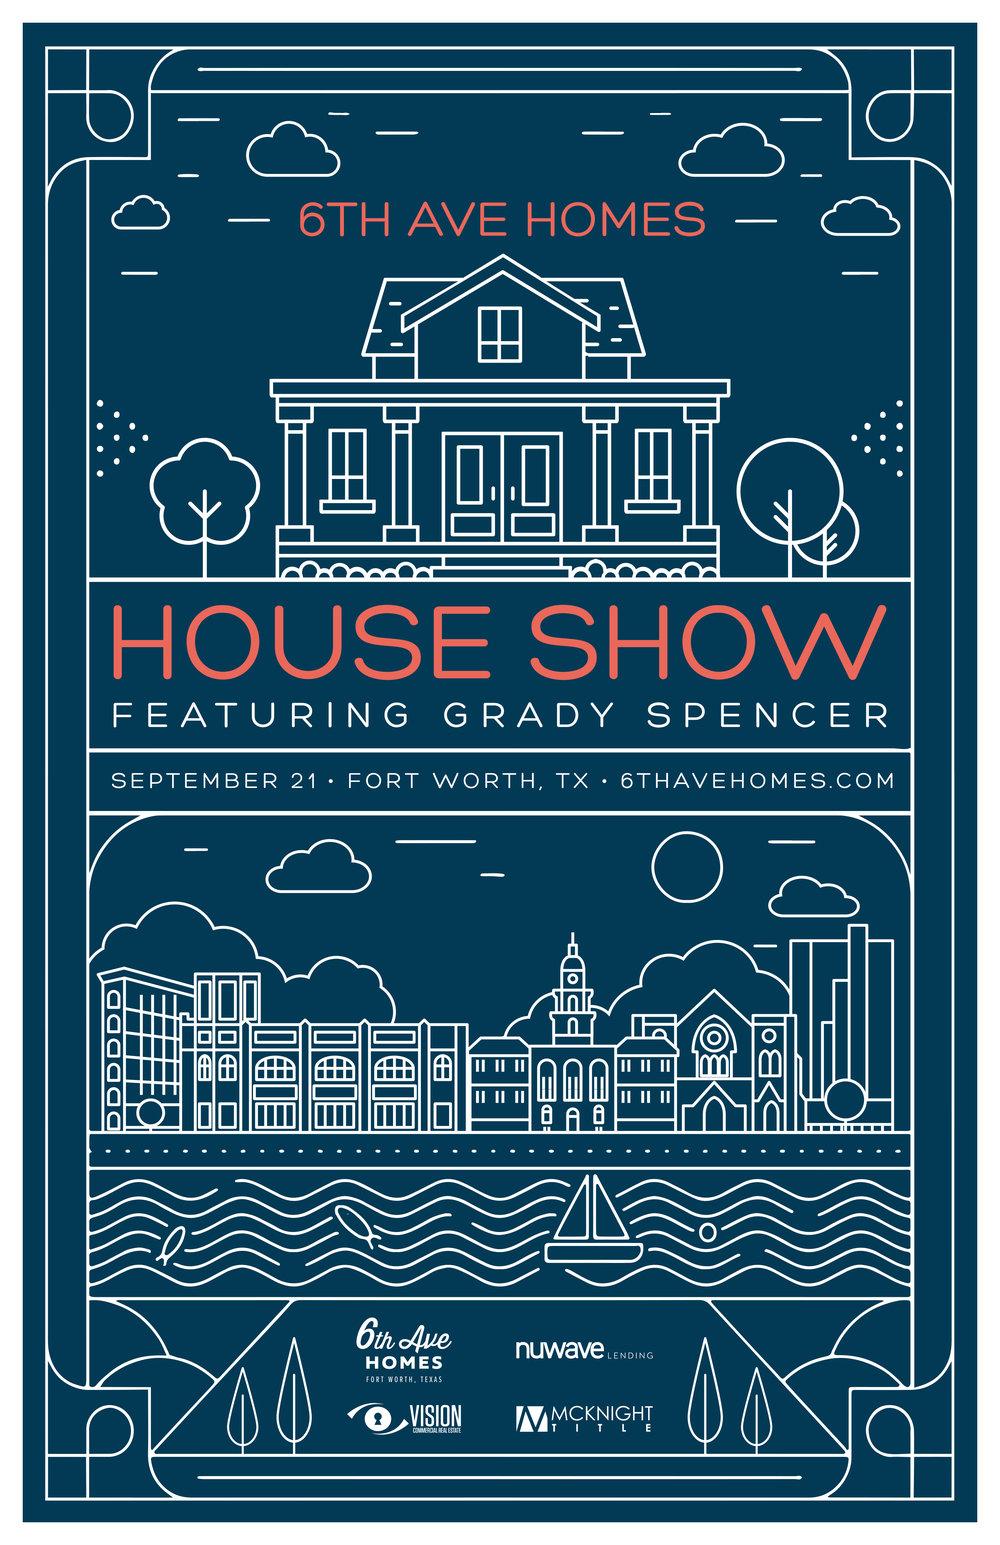 House Show 9-2018 Poster (5).jpg